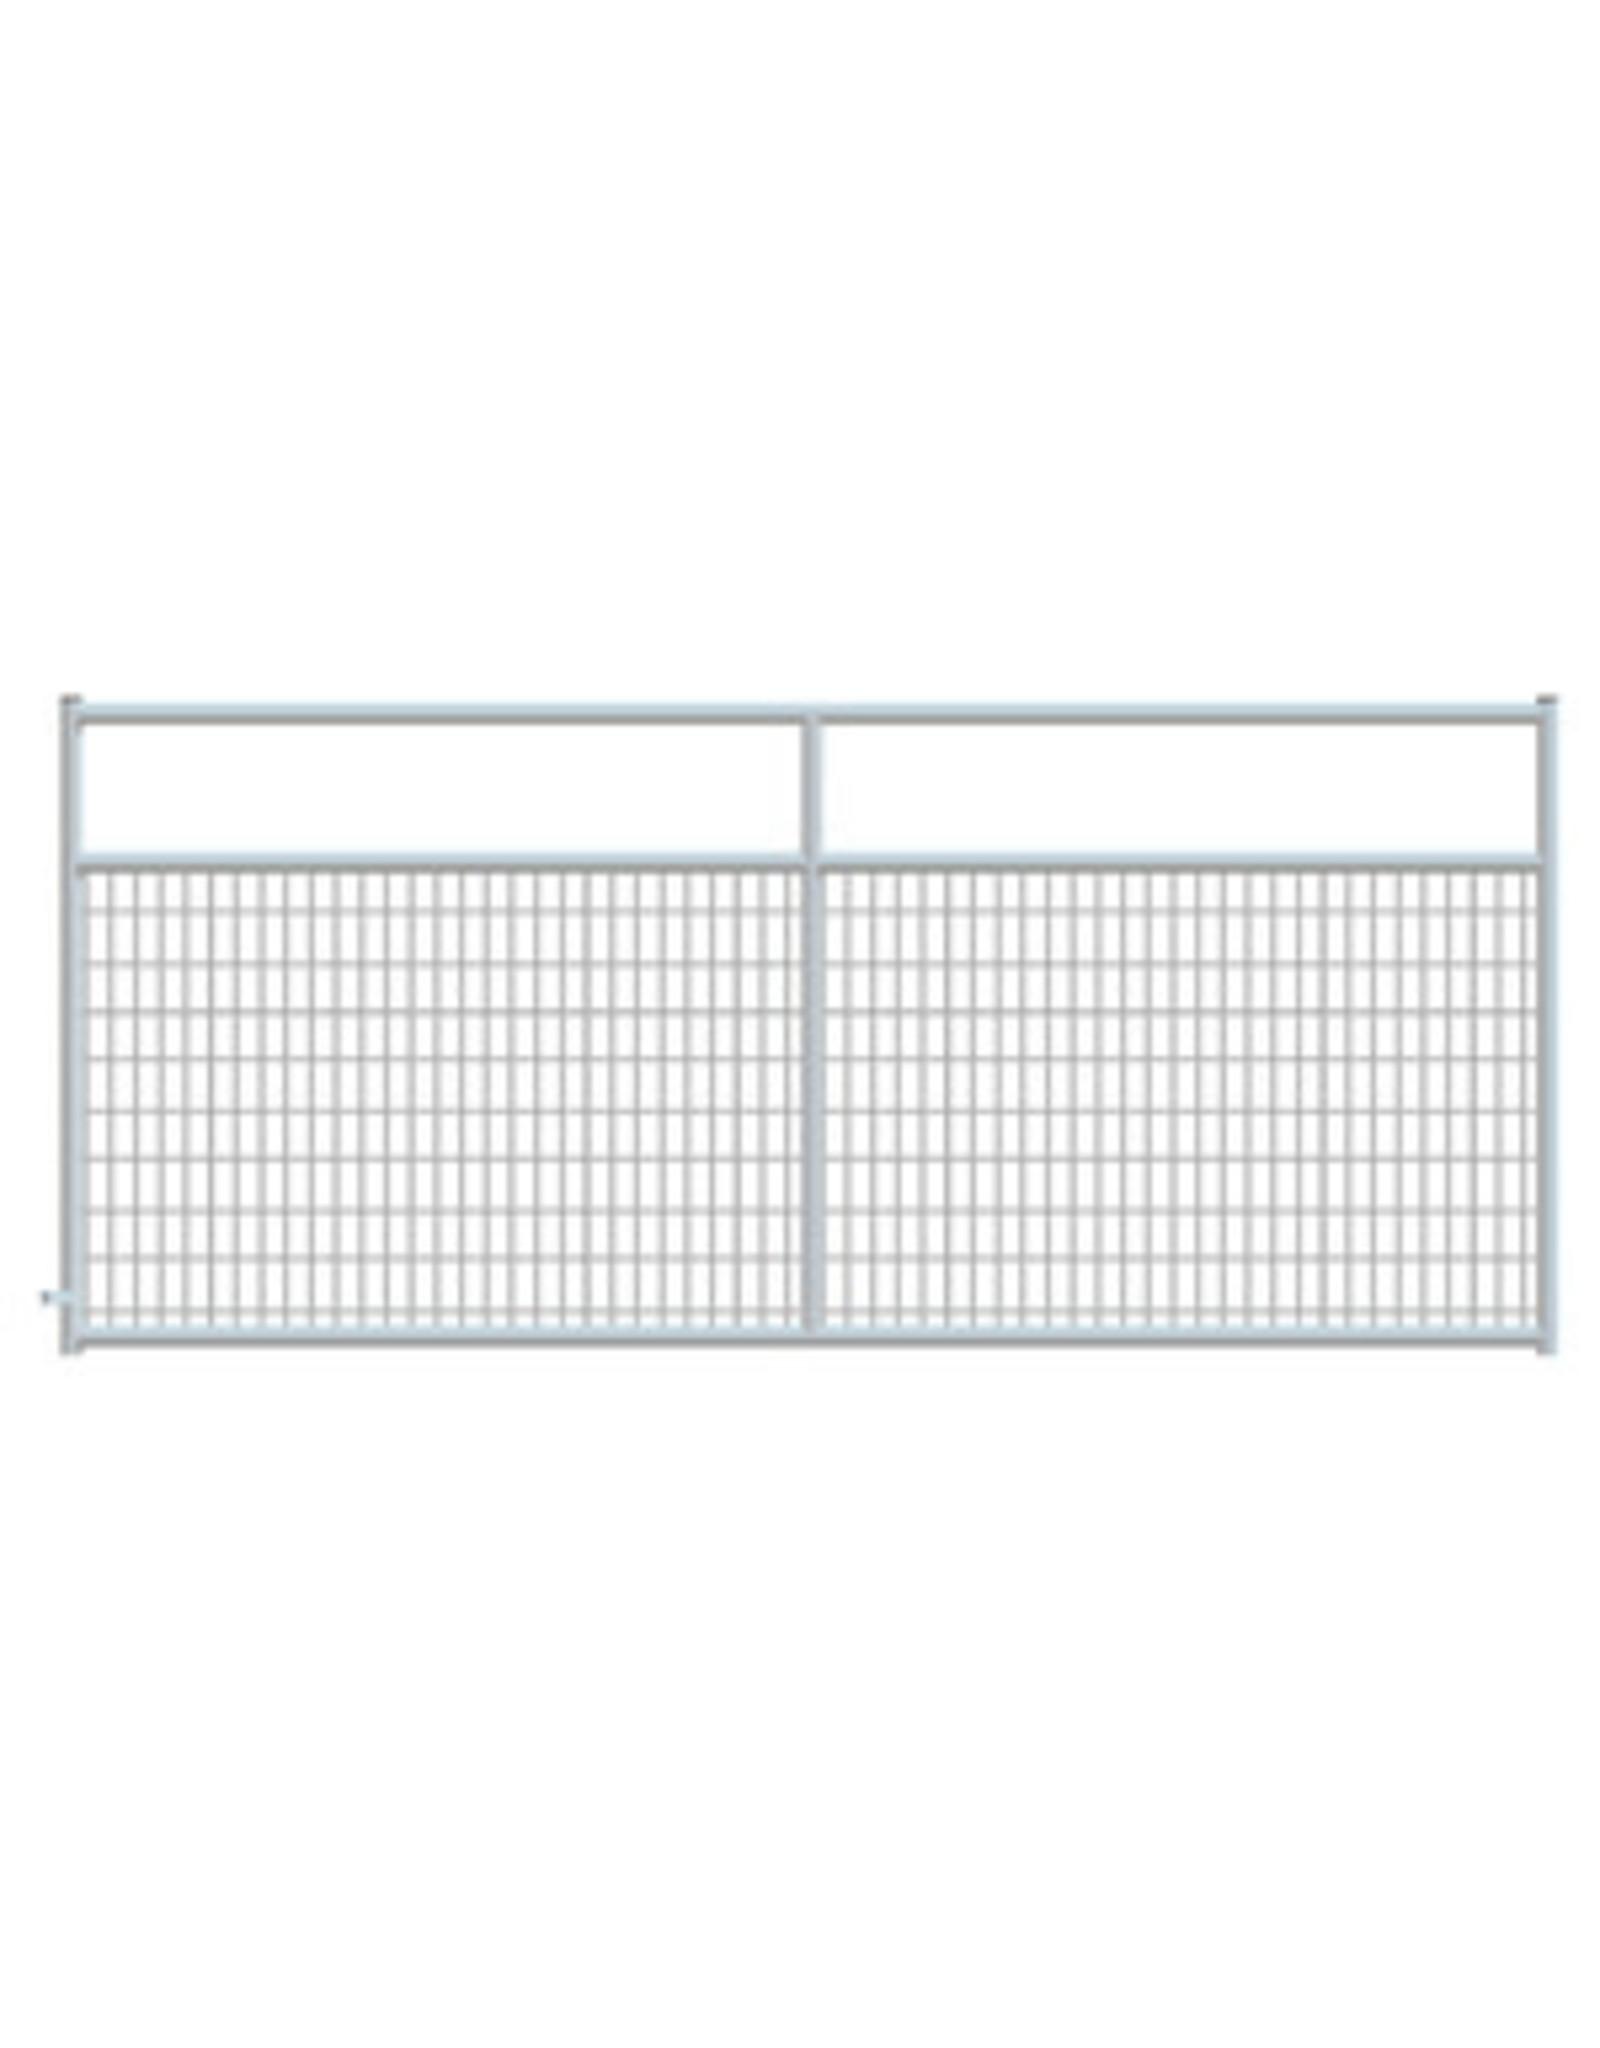 Gate, 2x4 Wire Fill 10'